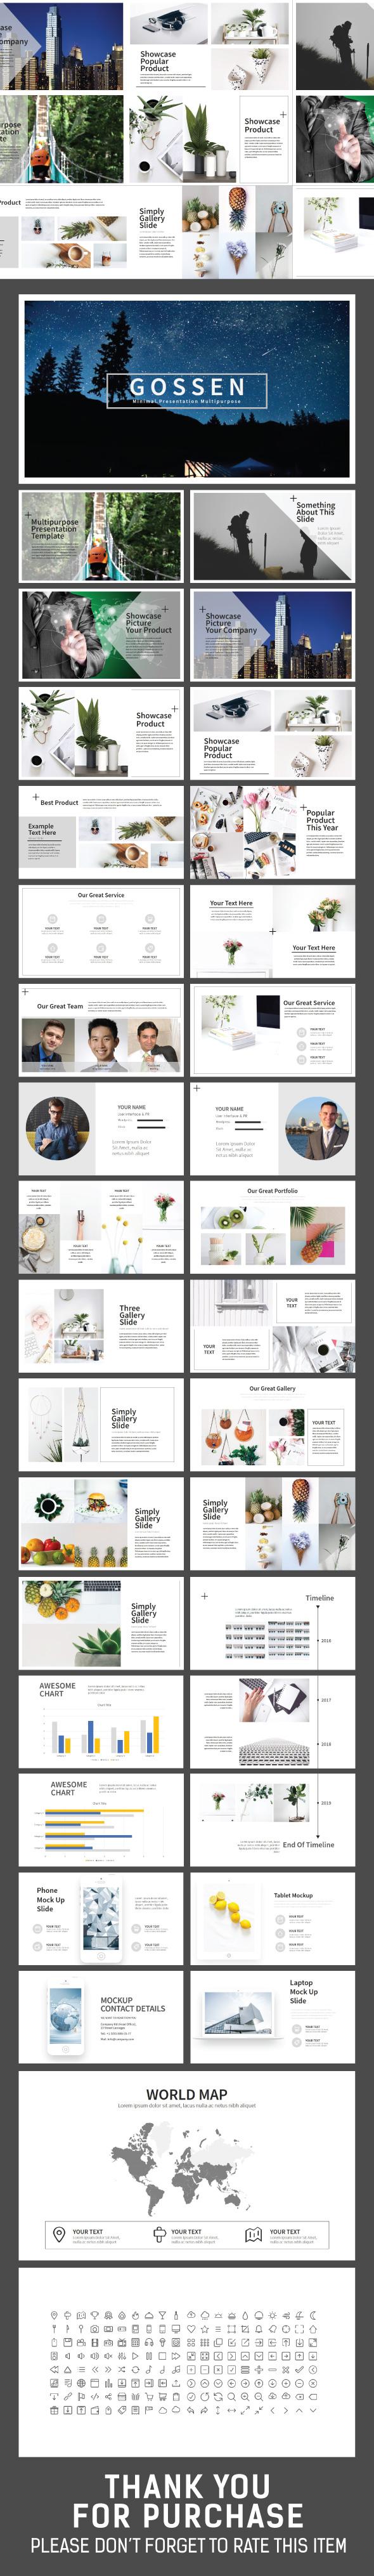 Gossen Minimal Presentation - Creative PowerPoint Templates